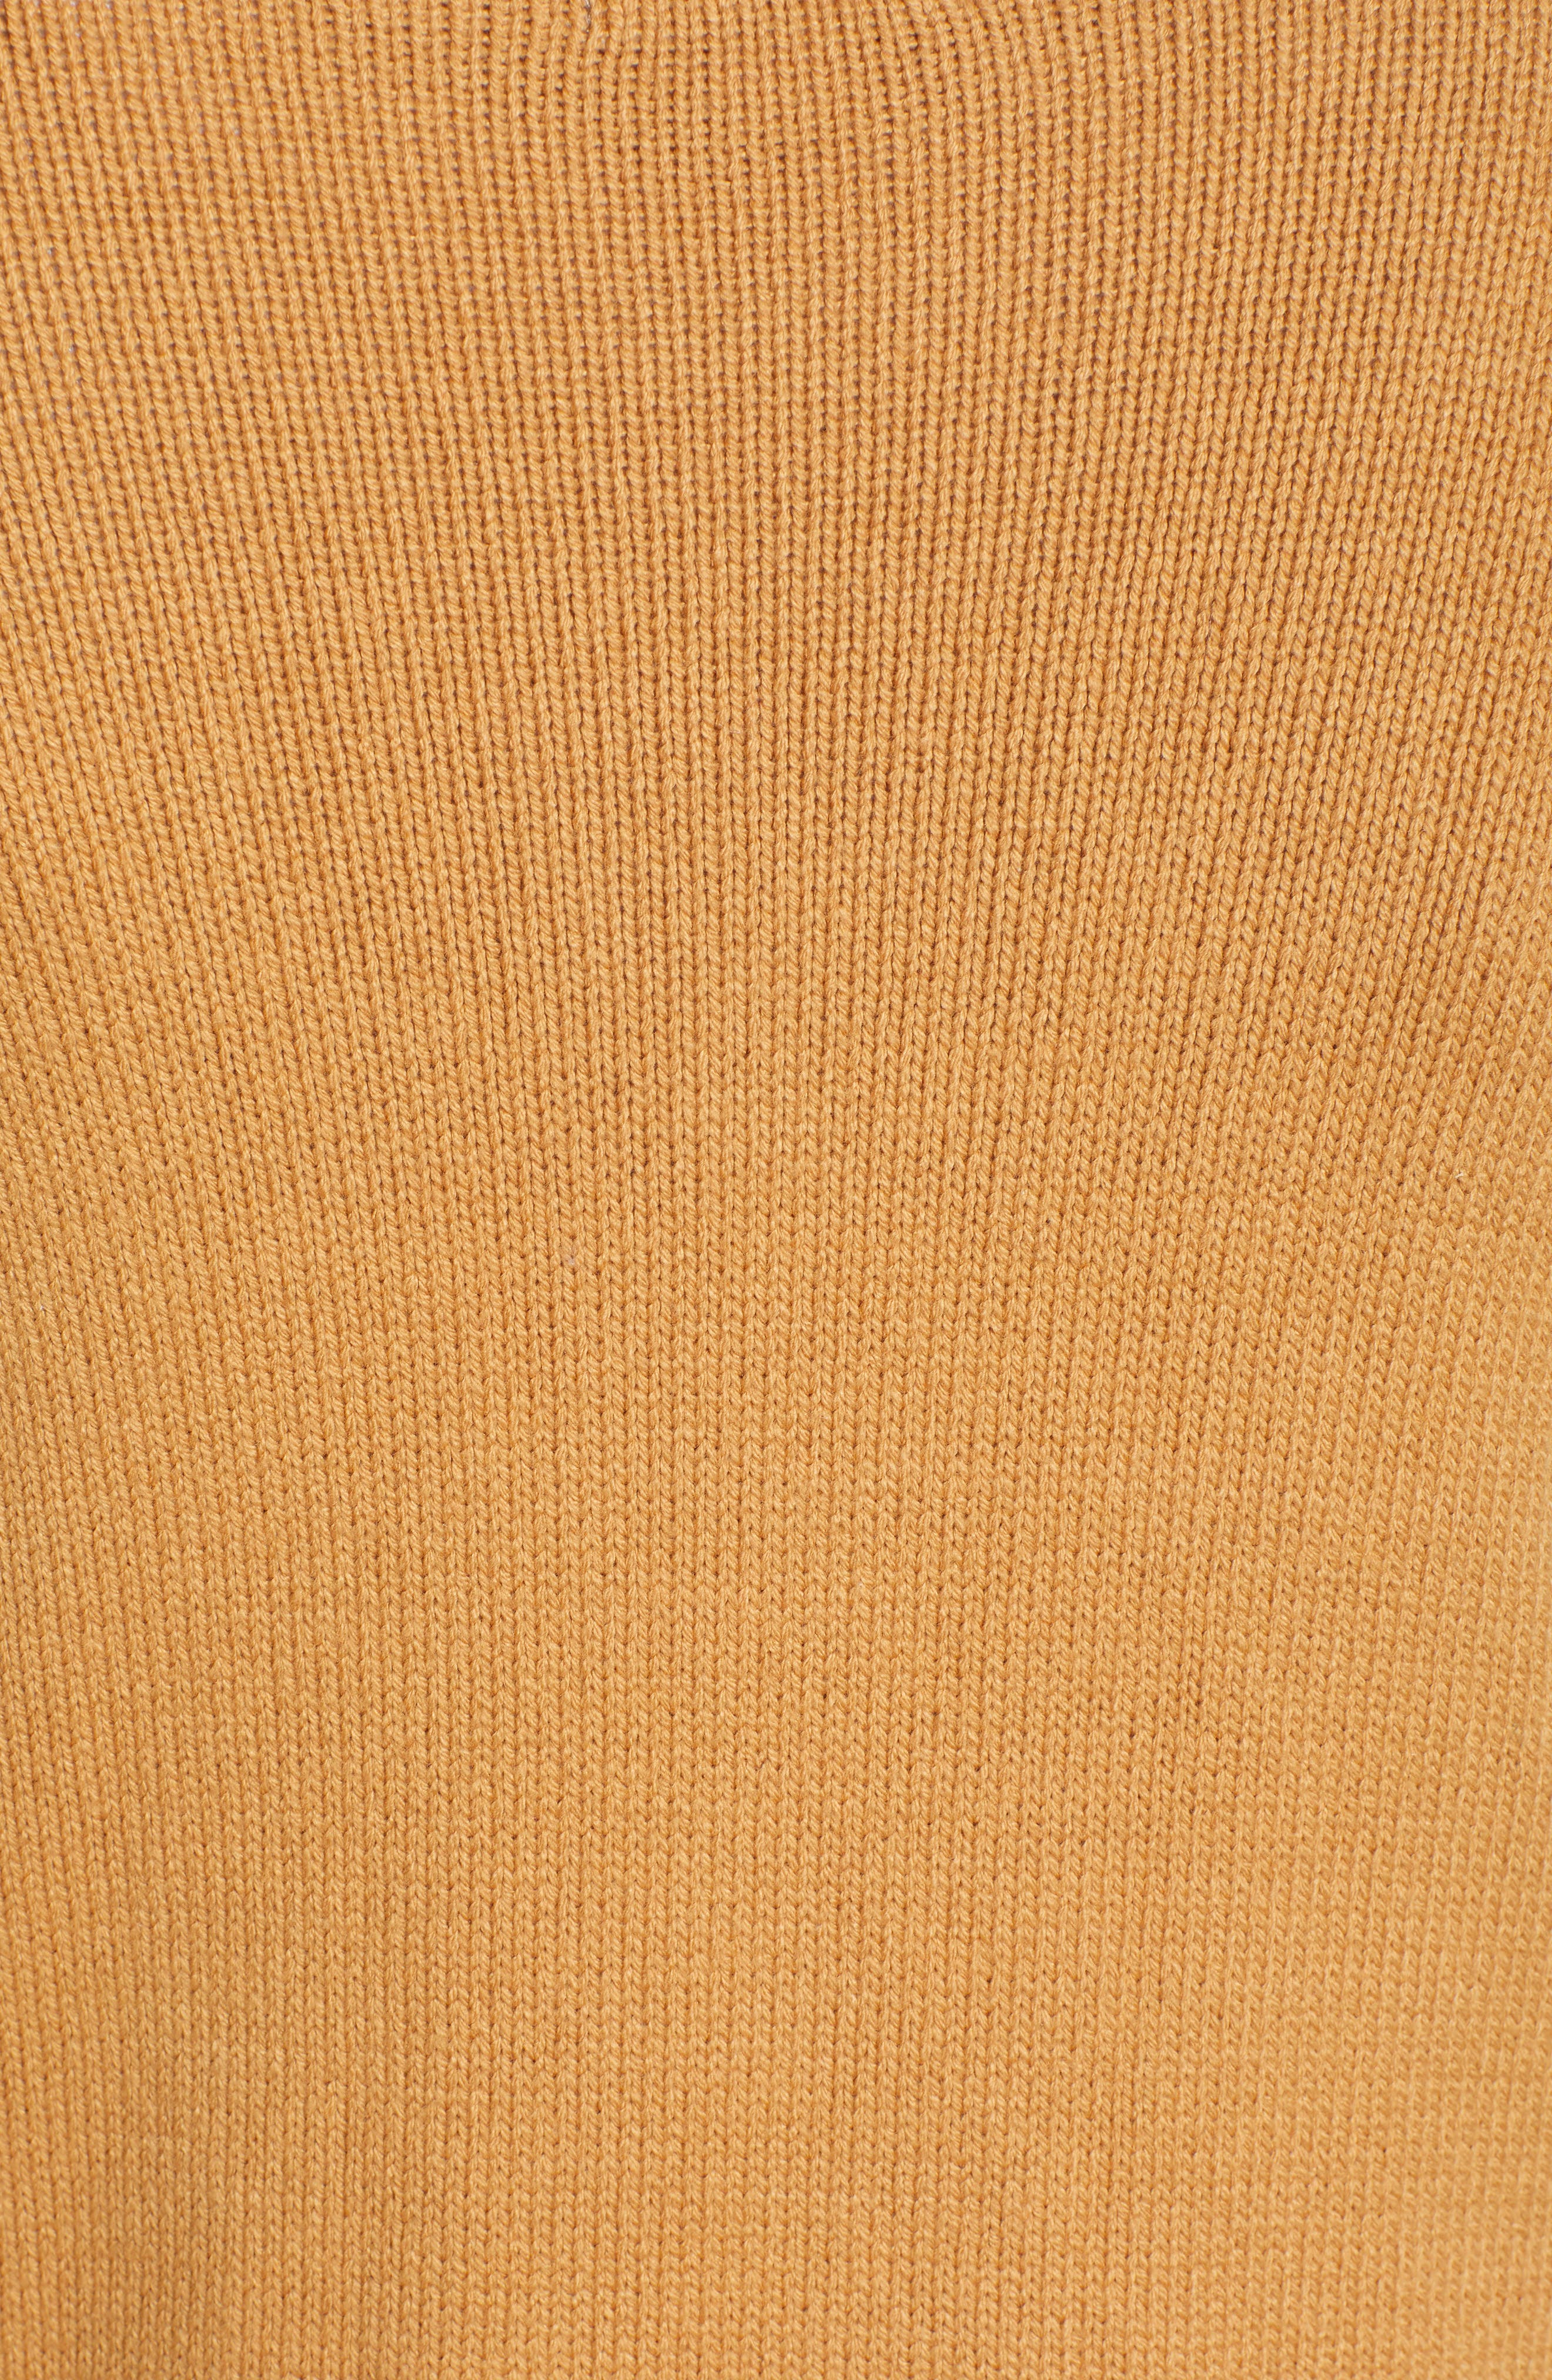 PRIMA,                             Two-Tone Cardigan,                             Alternate thumbnail 5, color,                             900